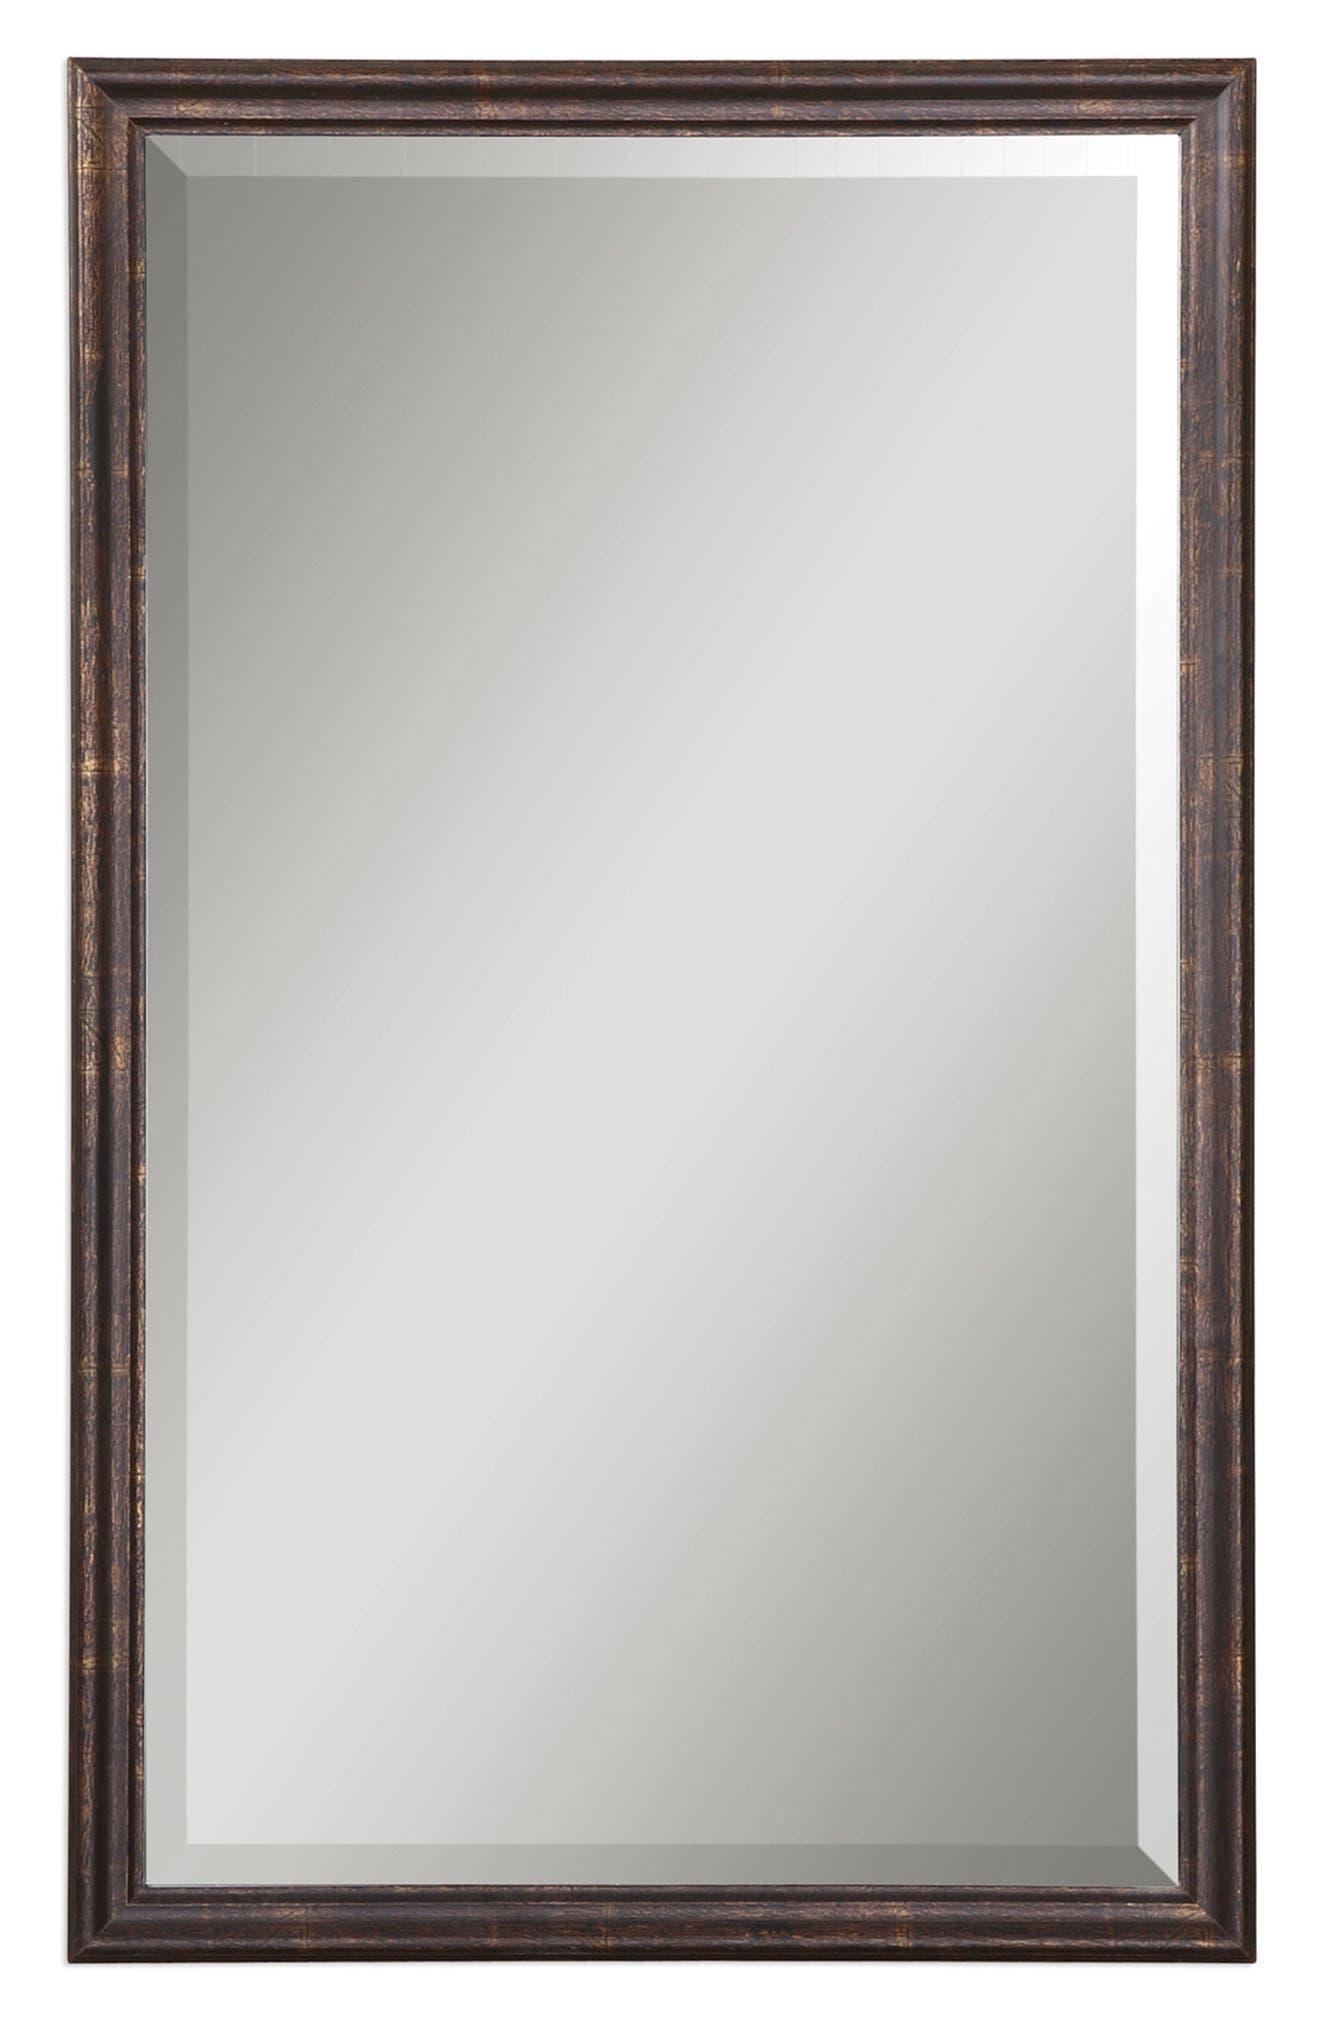 Alternate Image 1 Selected - Uttermost Renzo Vanity Mirror